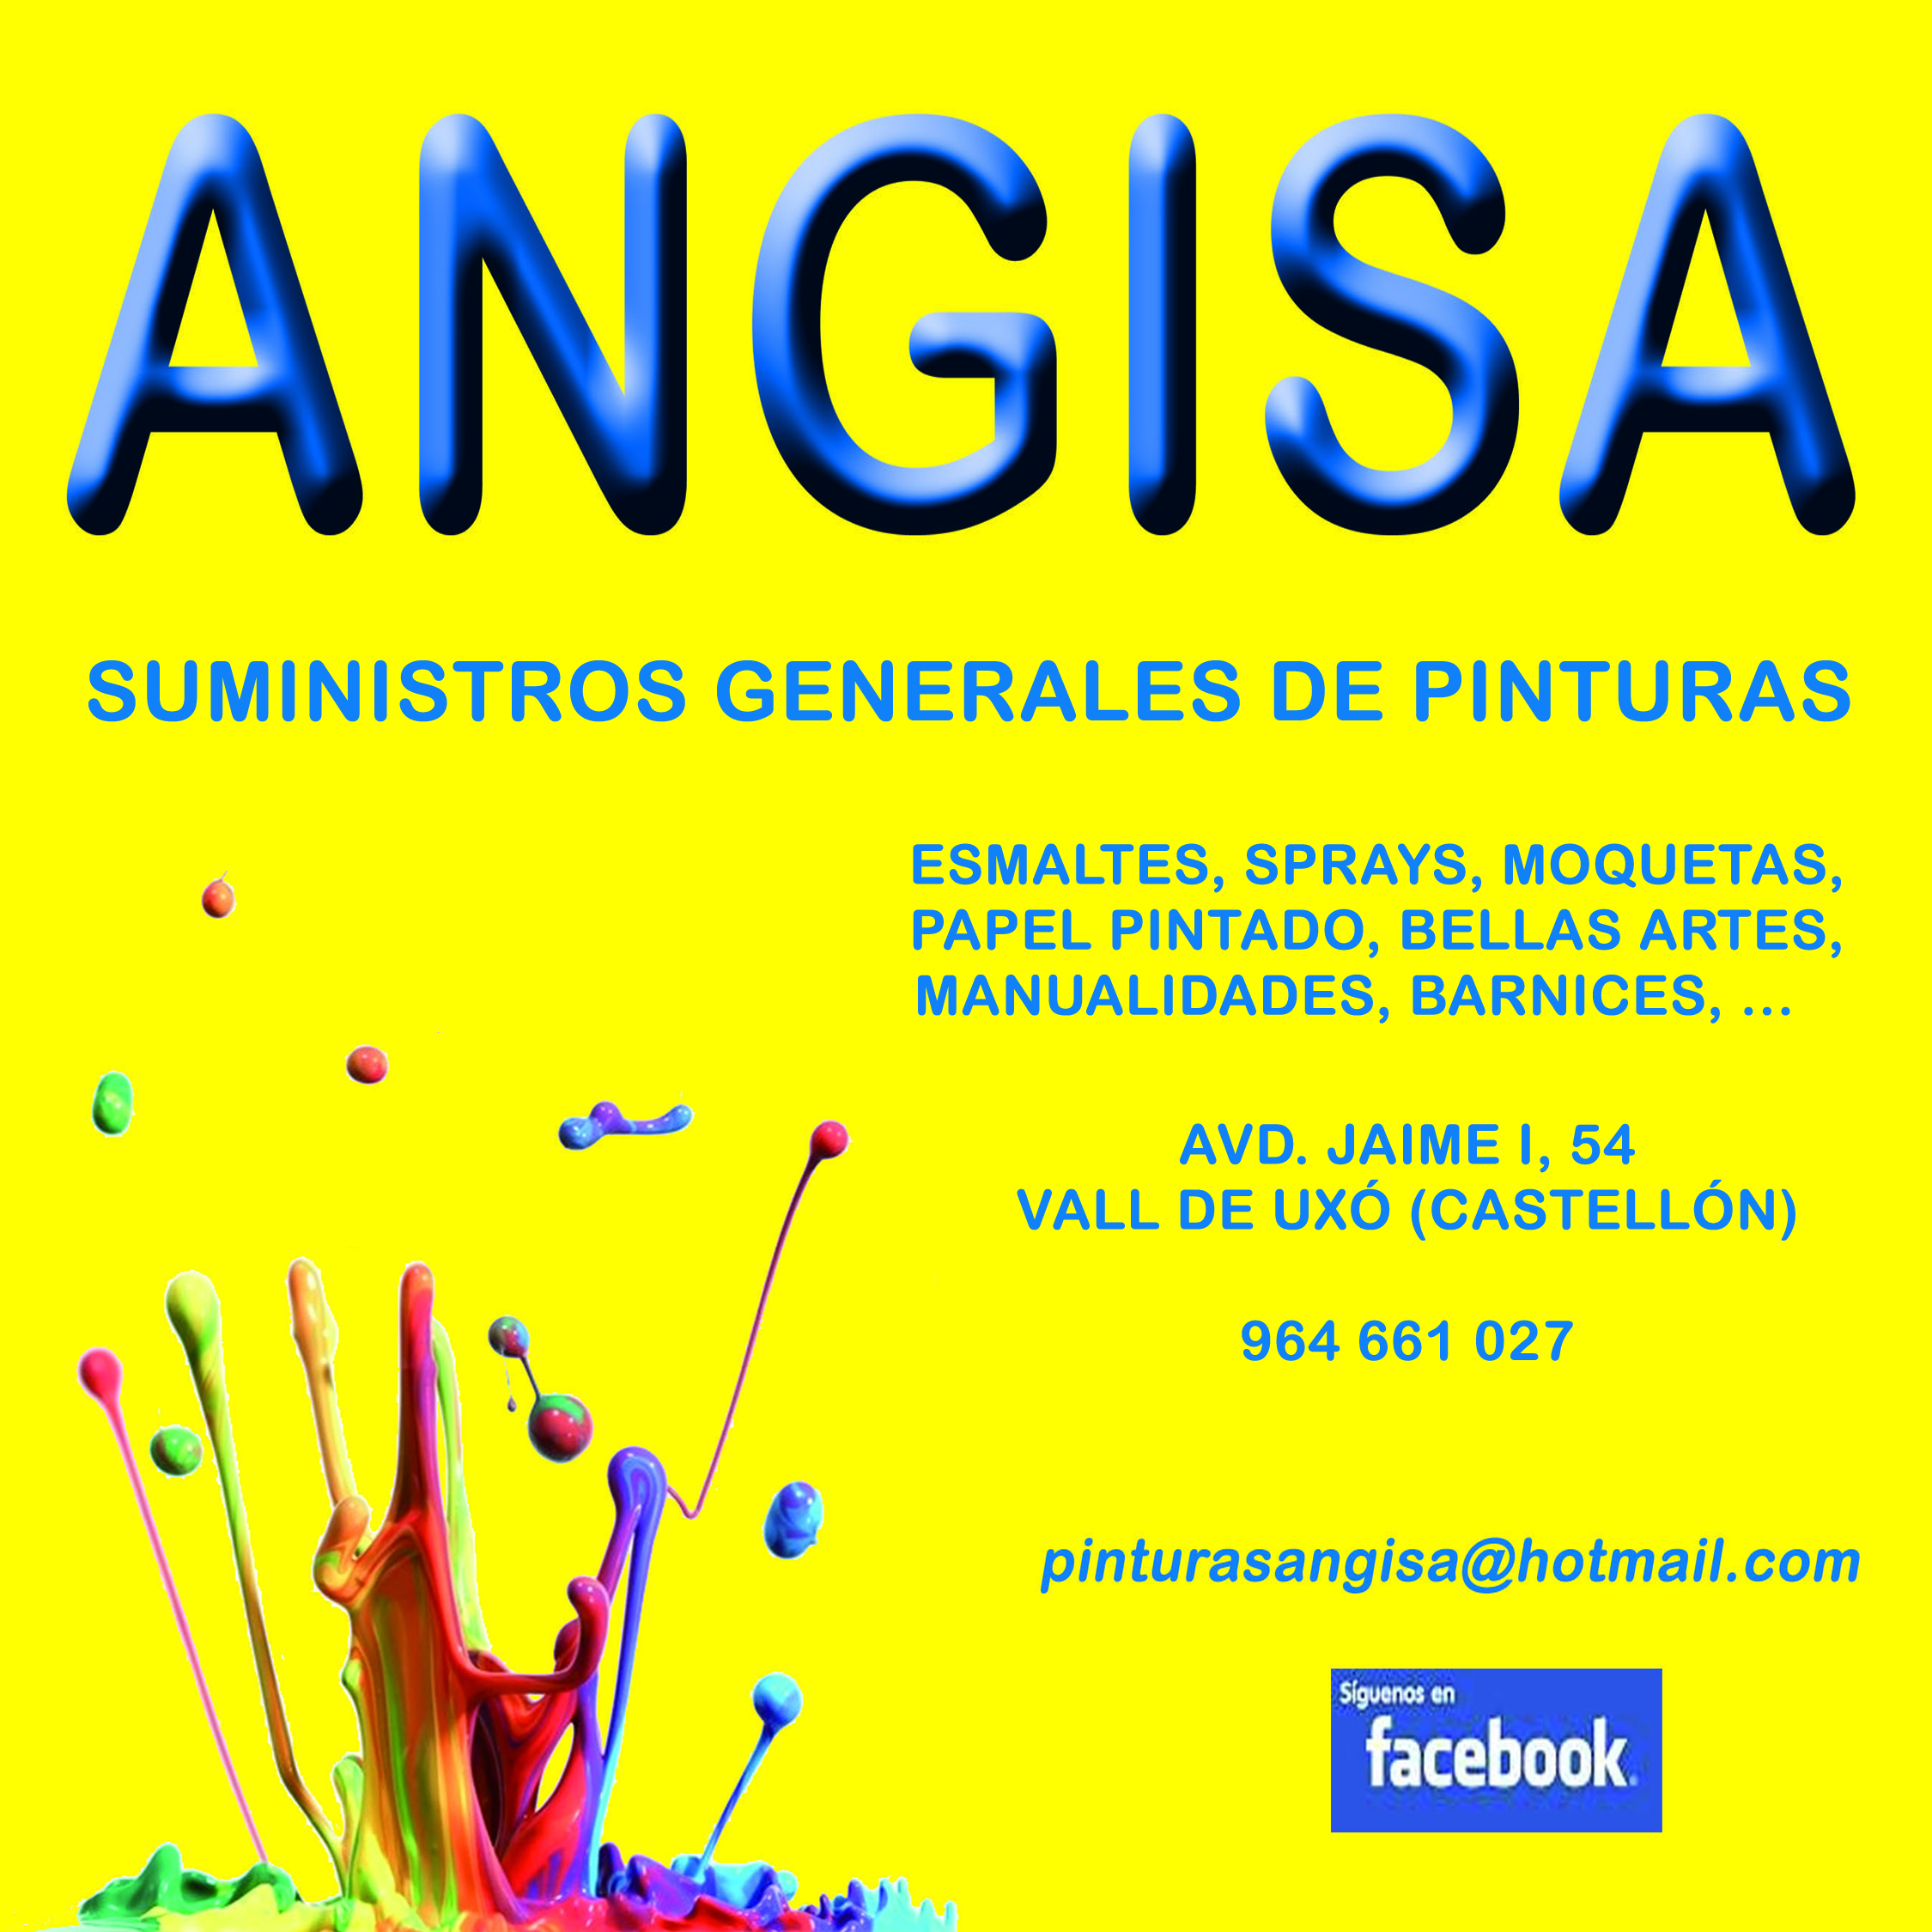 ANGISA WEB.jpg